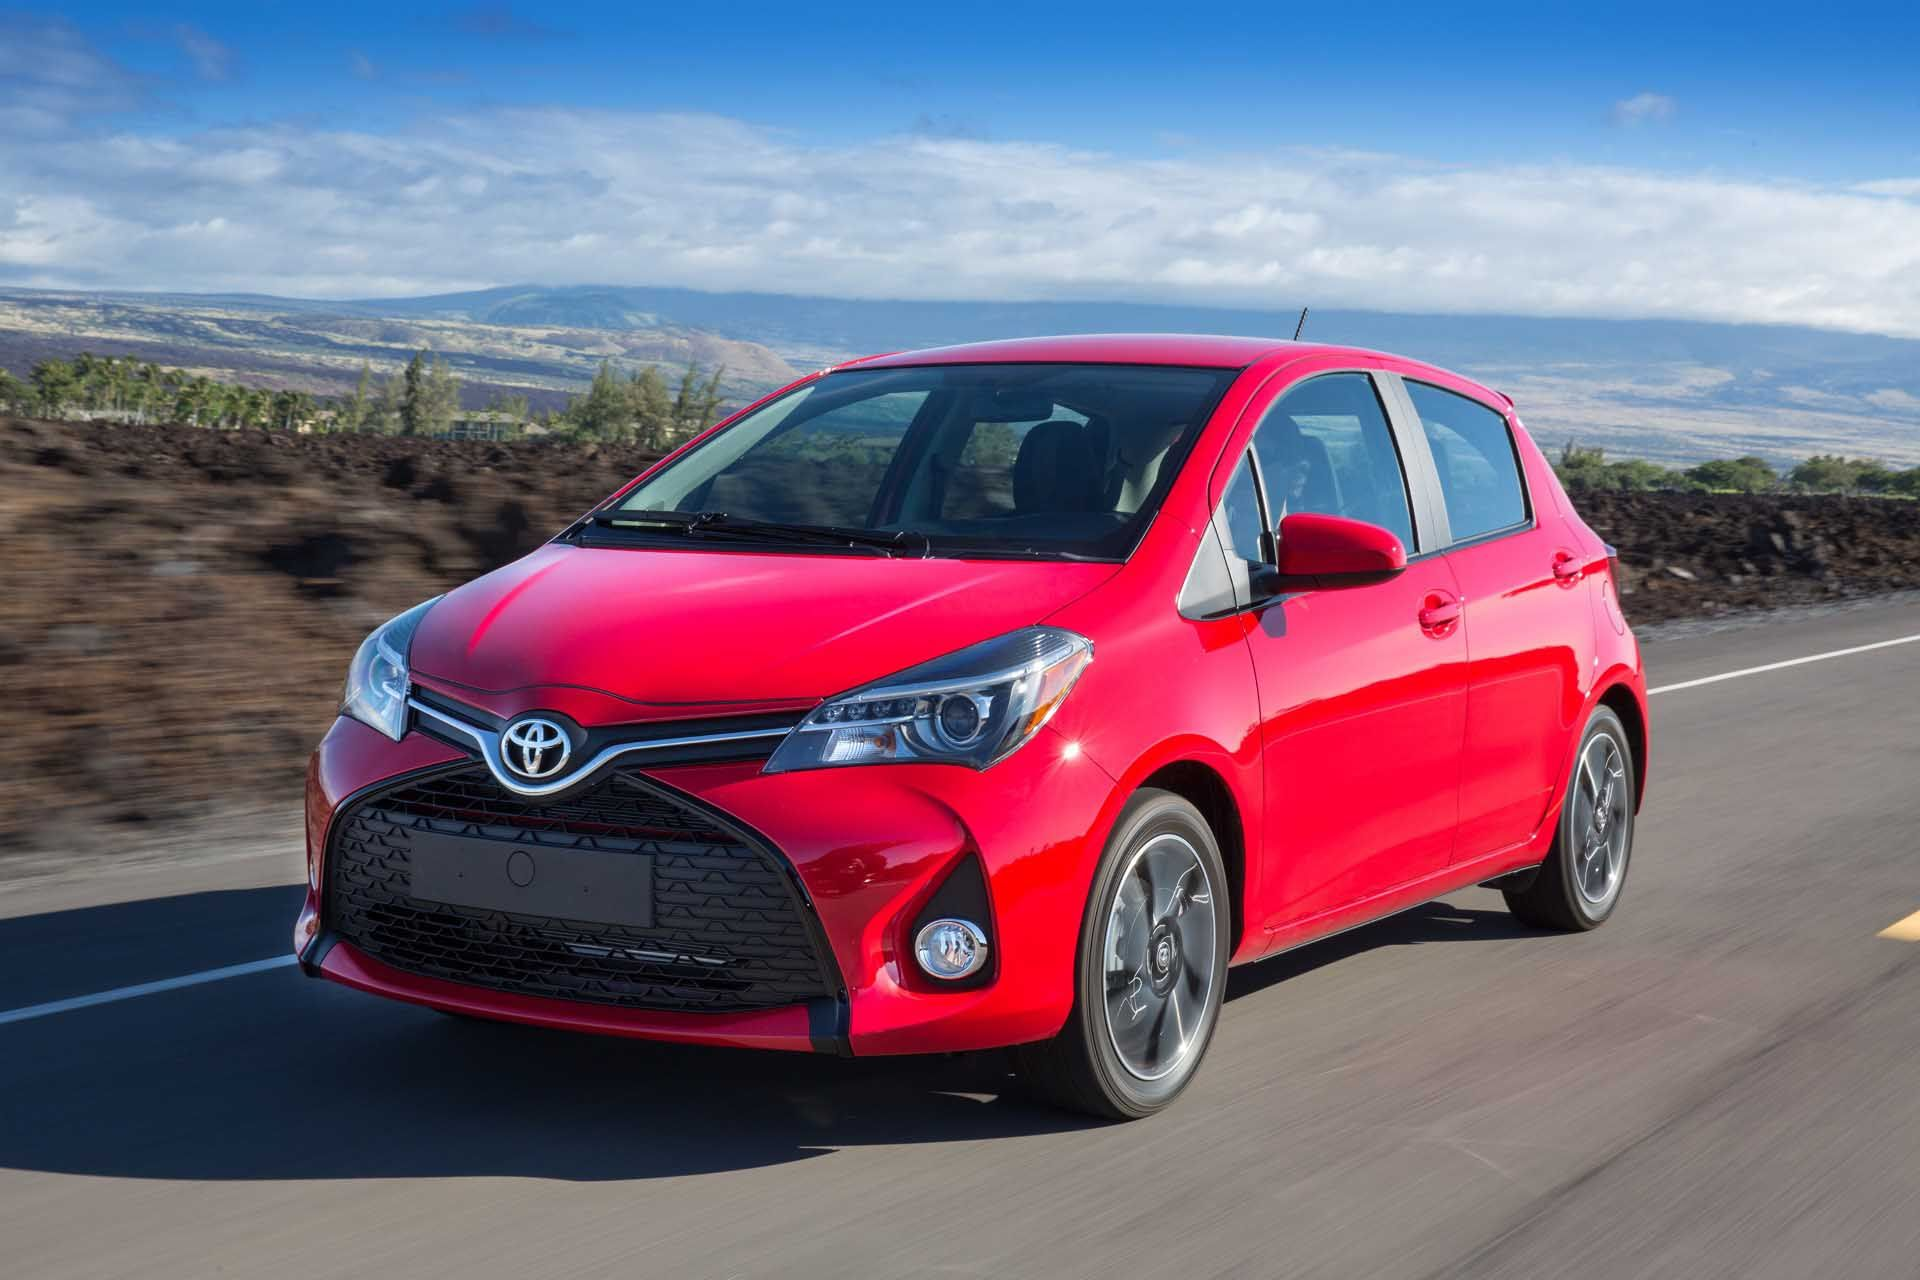 2015 Toyota Yaris White Toyota Reviews Yaris Toyota Hybrid